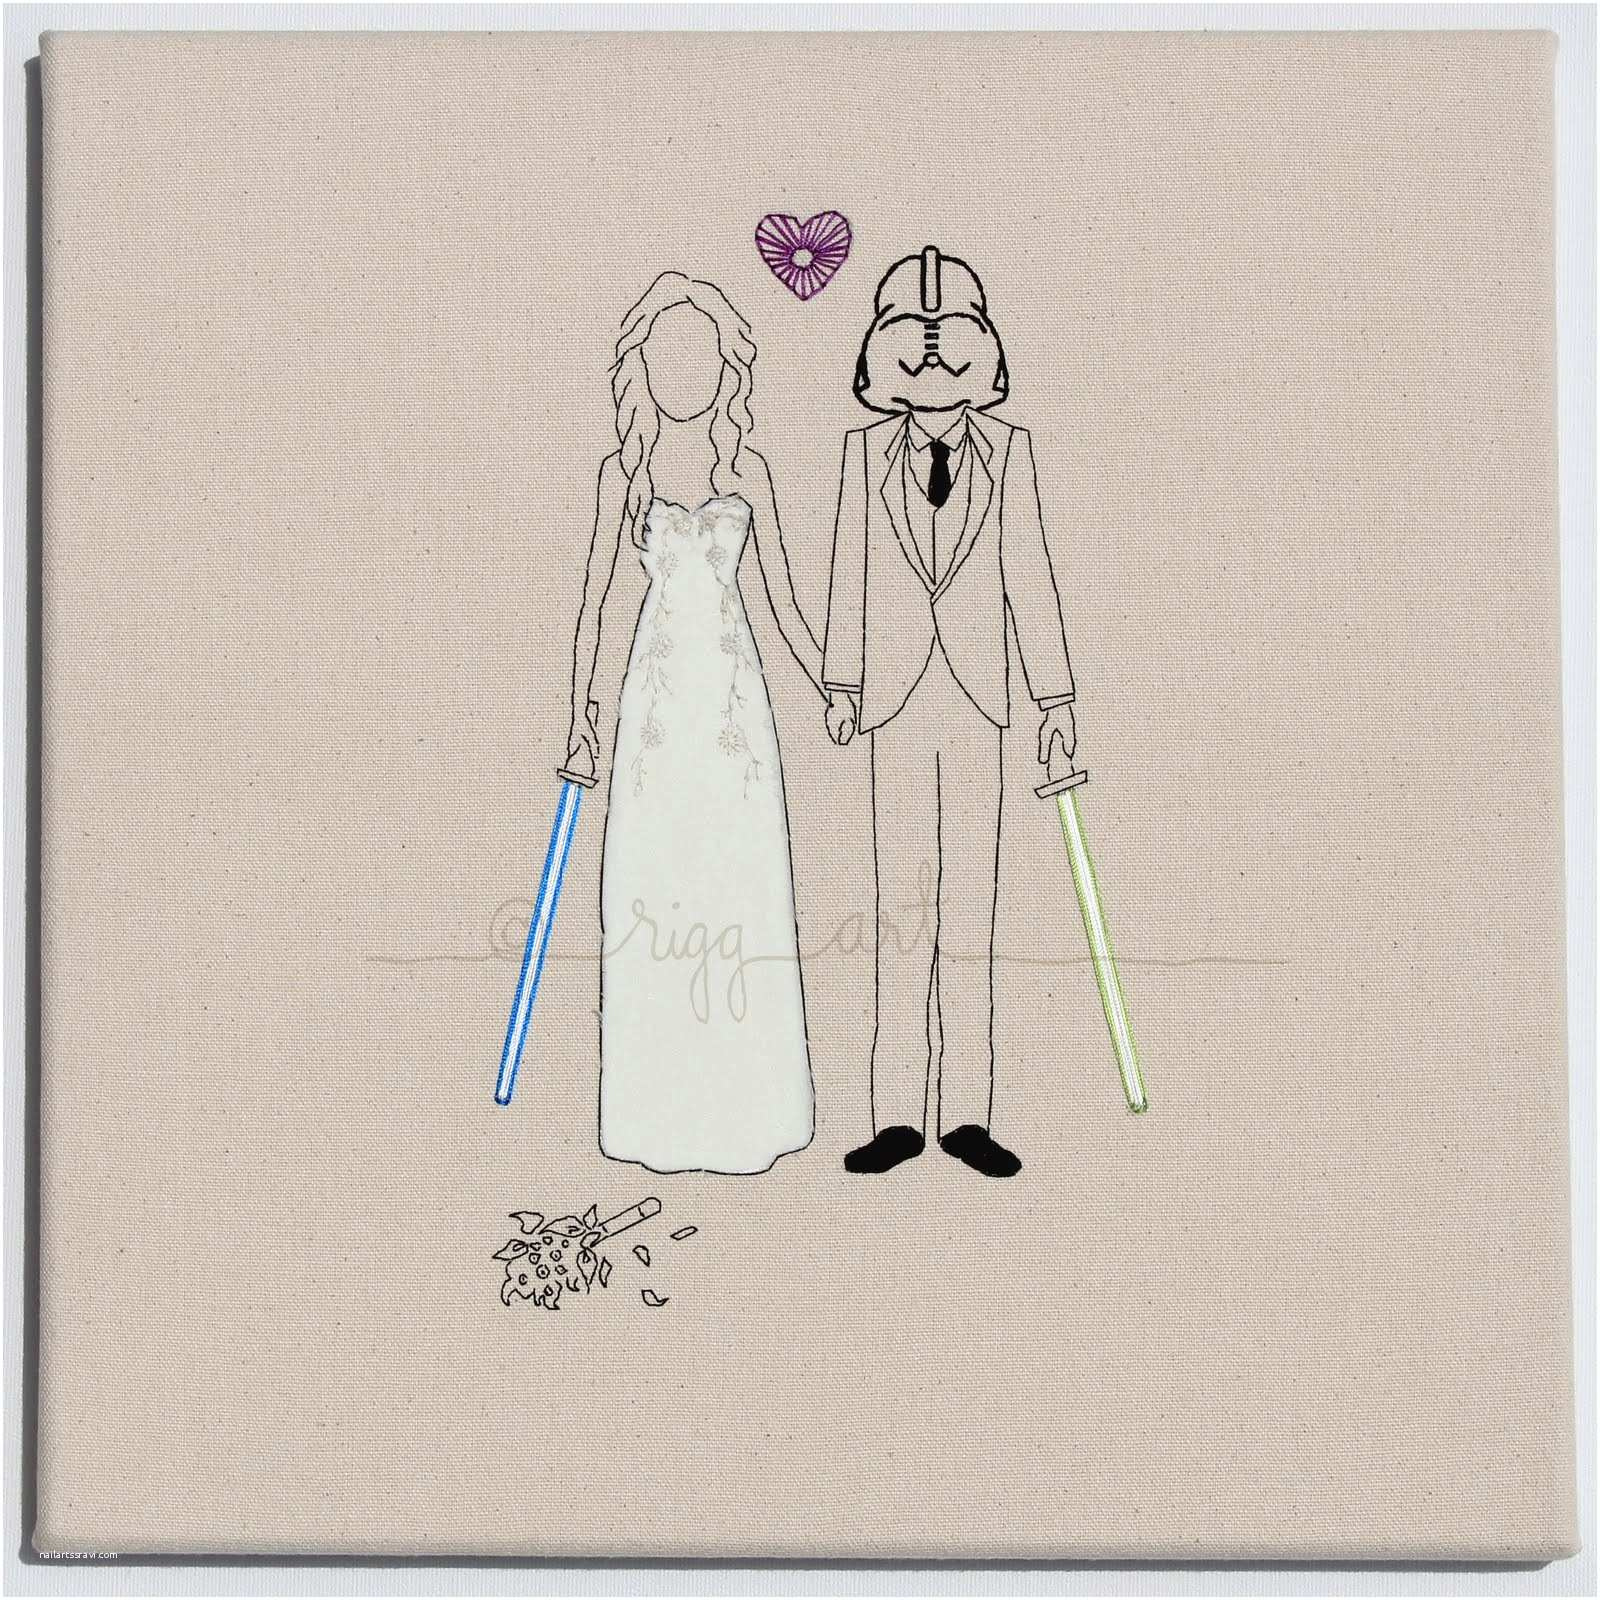 Star Wars themed Wedding Invitations Star Wars Bride Groom Wedding Portrait